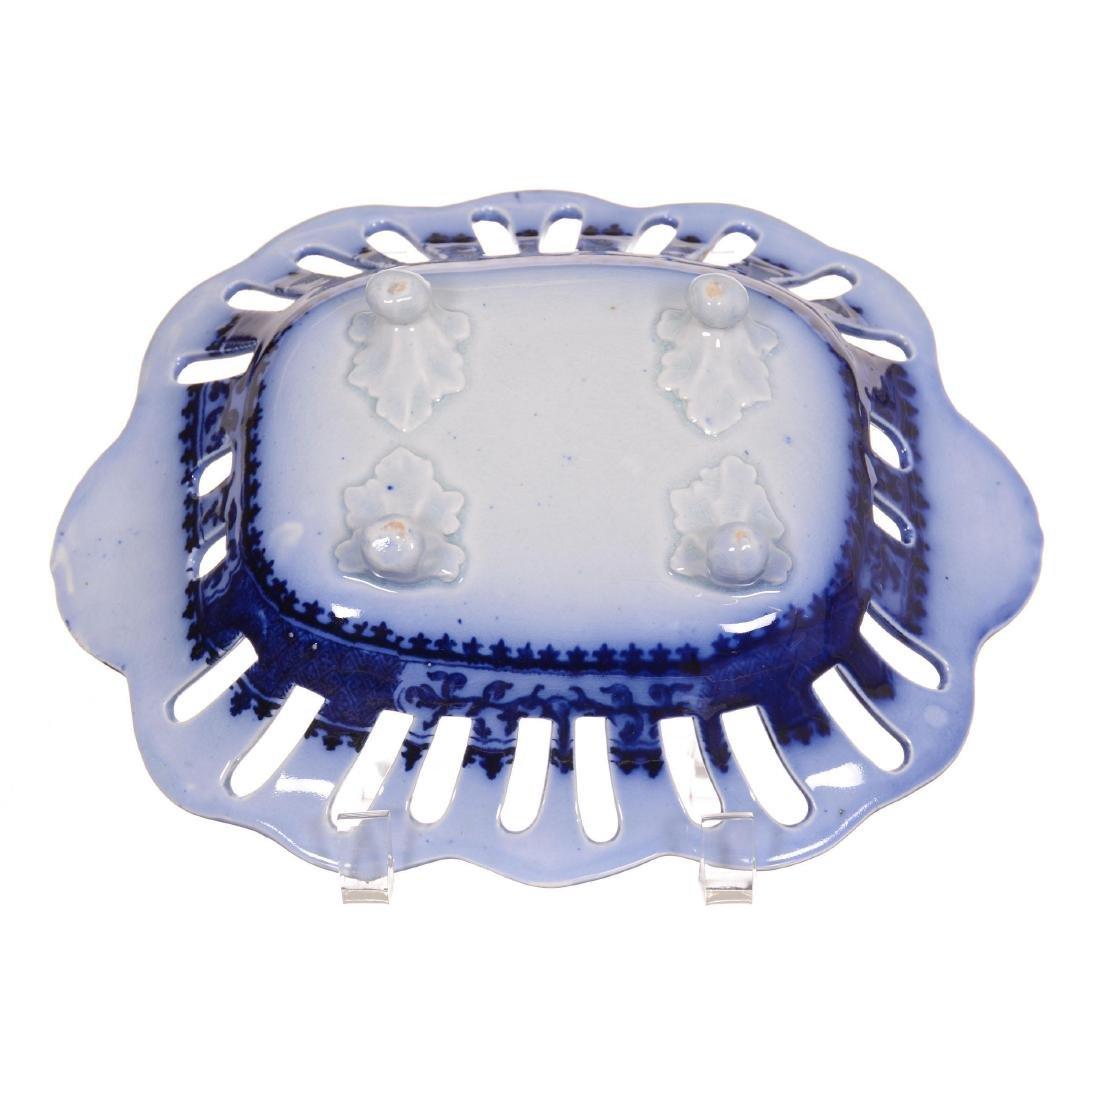 Flow Blue Pierced Bowl - 2